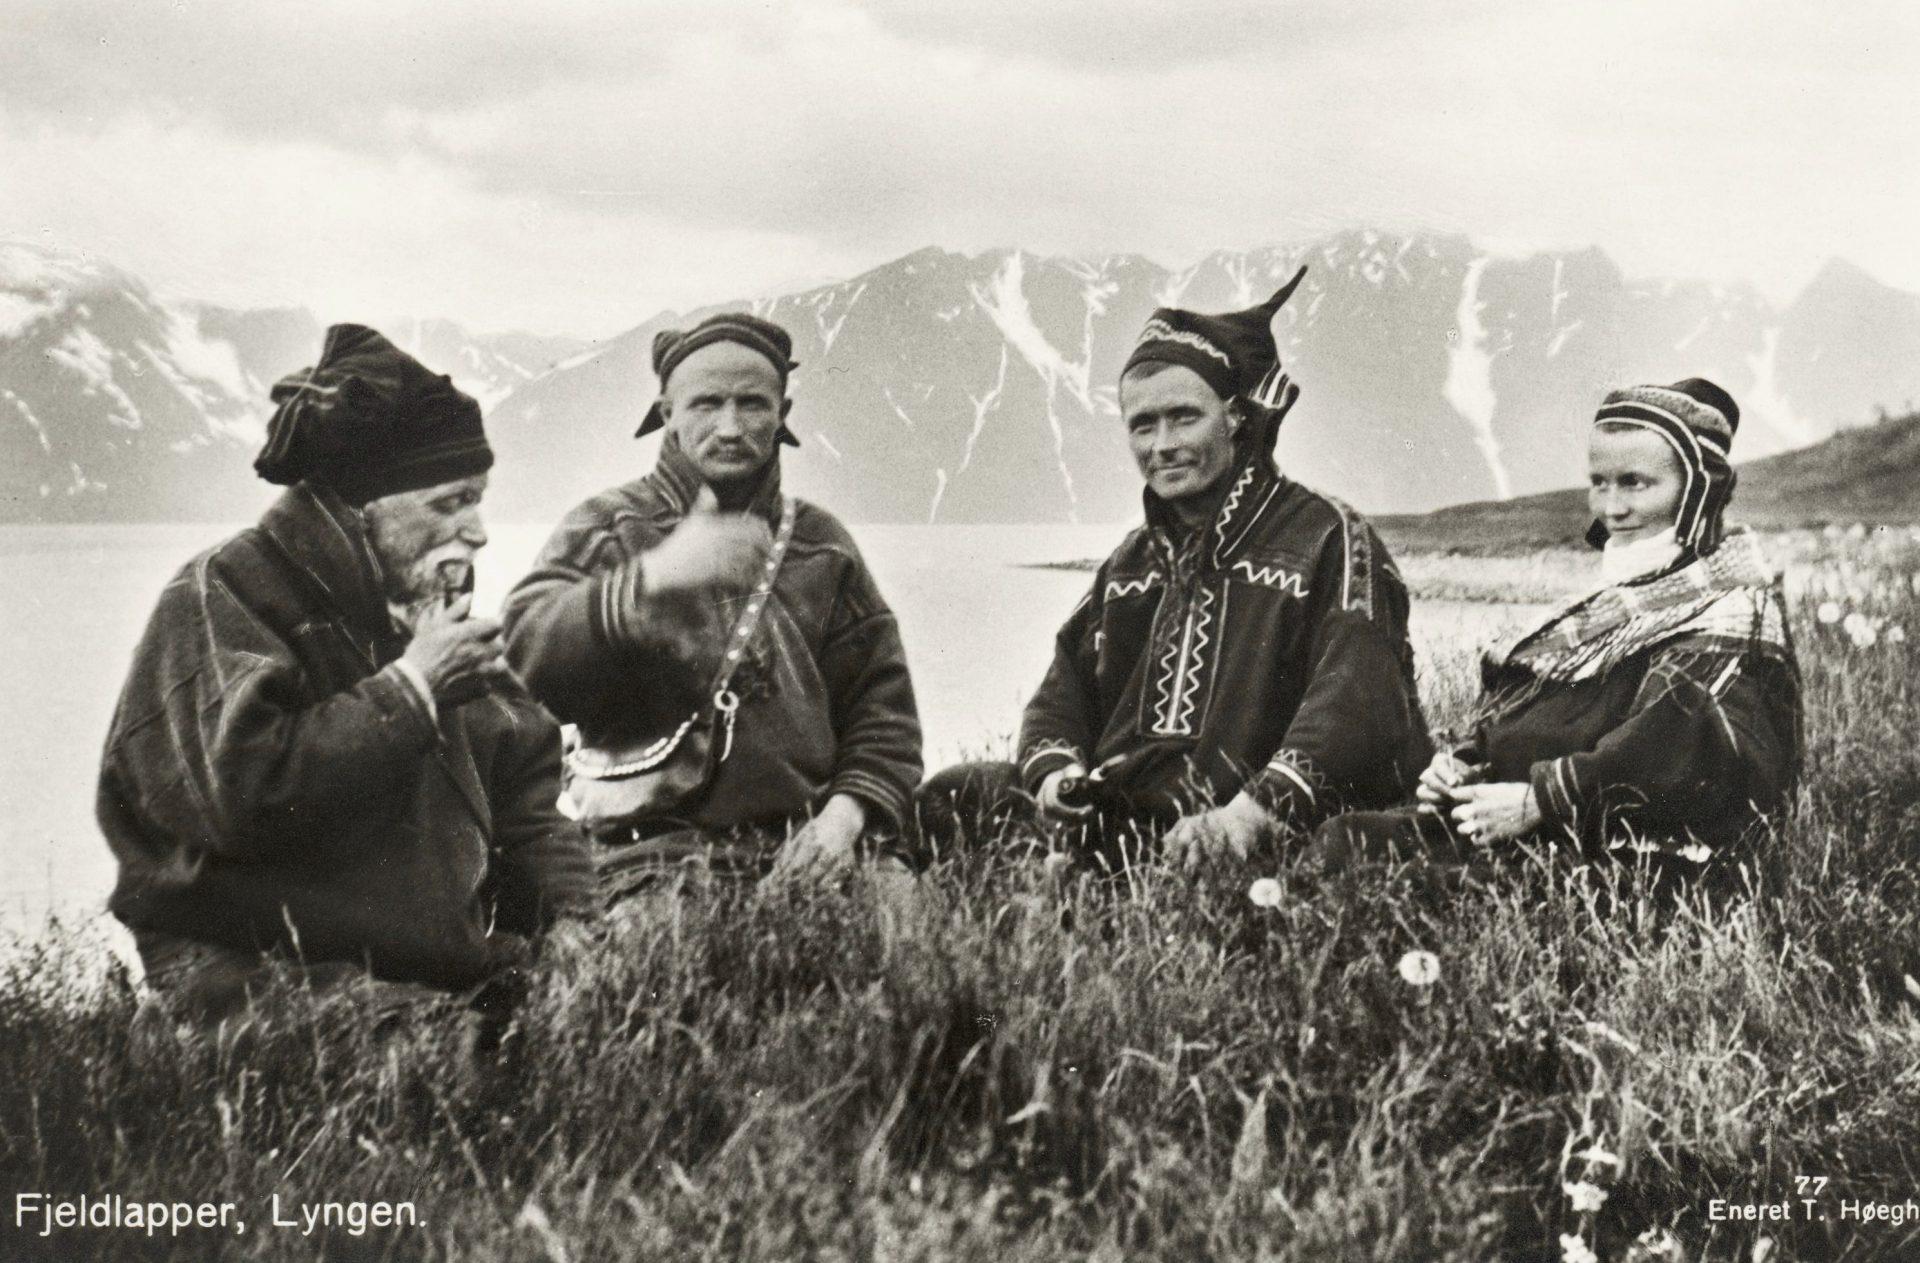 1928 Lyngen Troms Norway group Mountain Sami people. Credit: T. Høegh/Wikimedia Commons